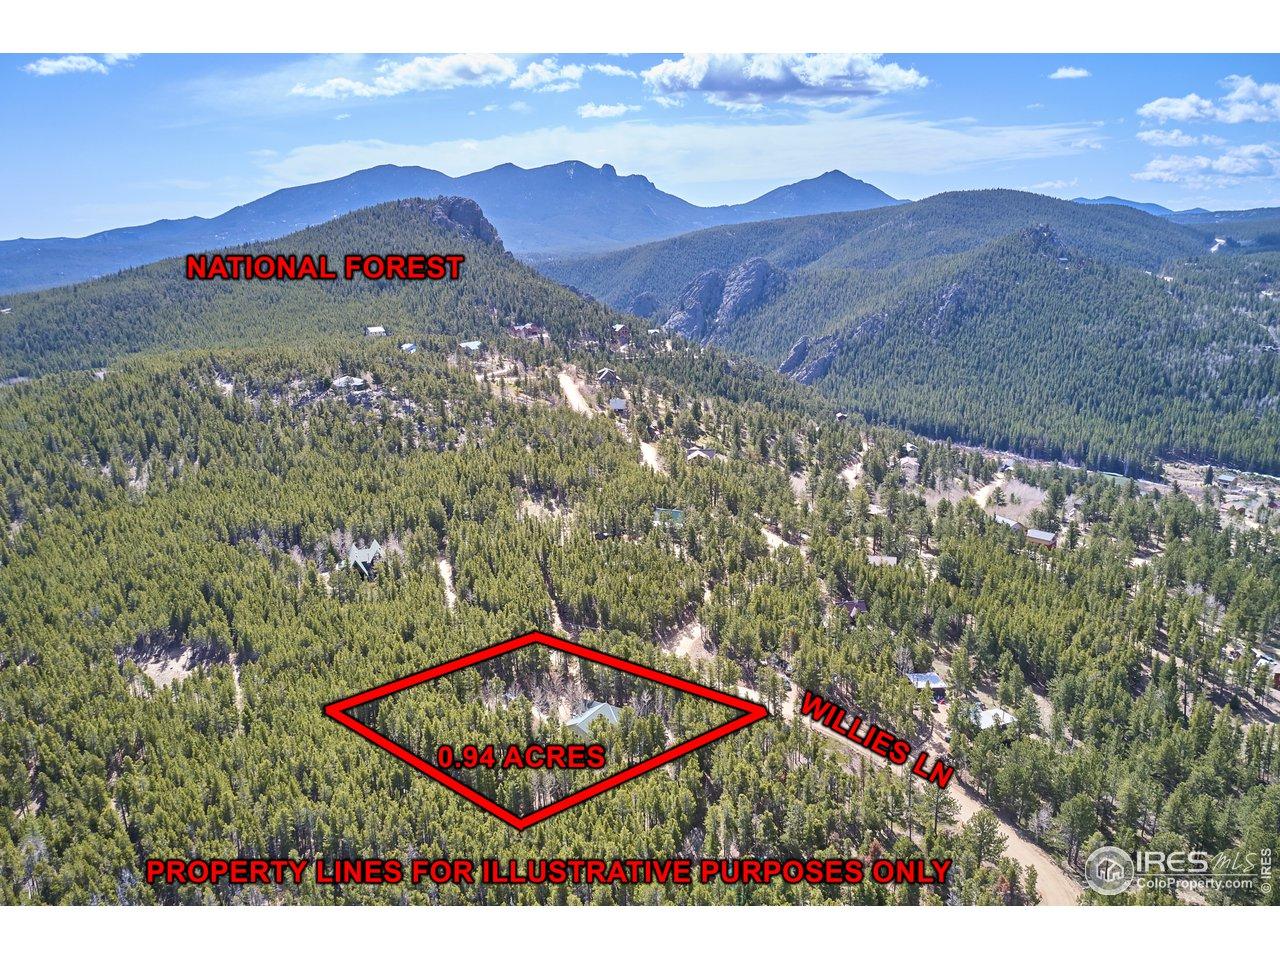 Rollins Peak offers great trails